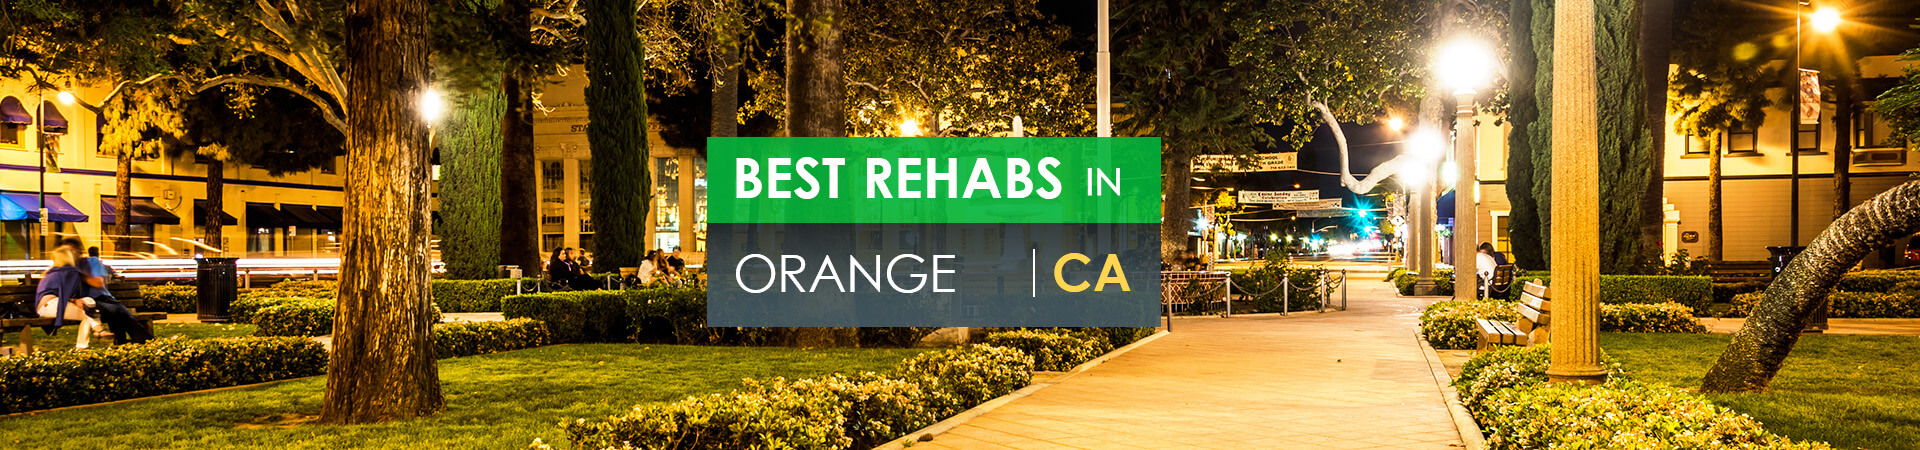 Best rehabs in Orange, CA